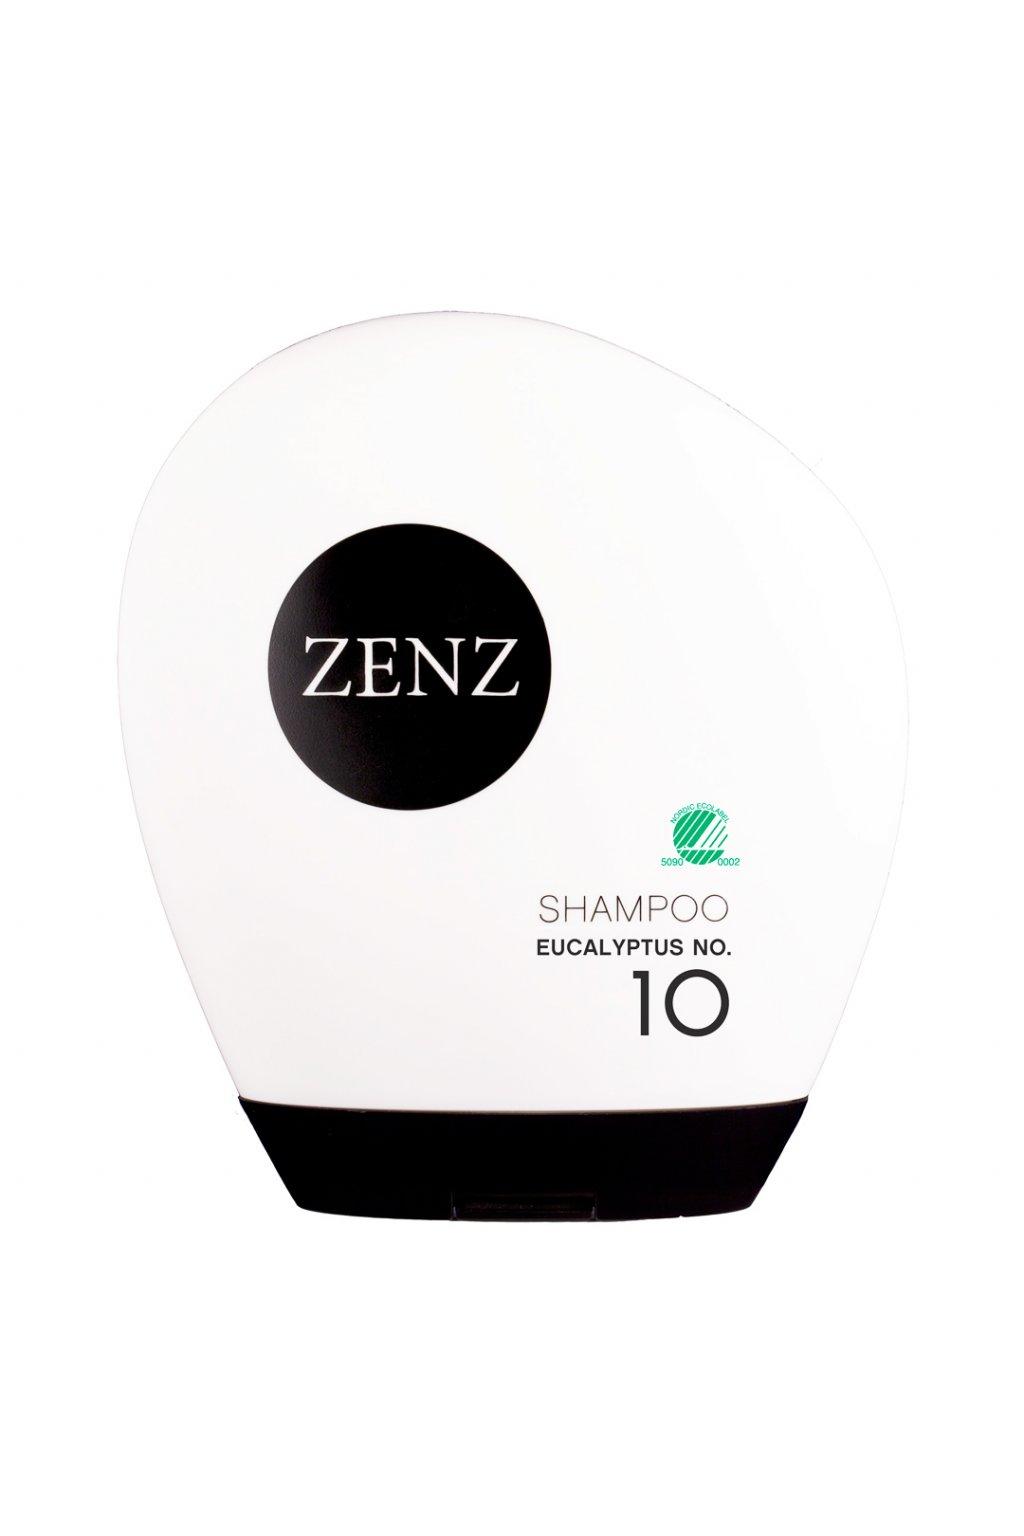 ORGANIC SHAMPOO ZENZ EUCALYPTUS 10 250ml PRODUCT